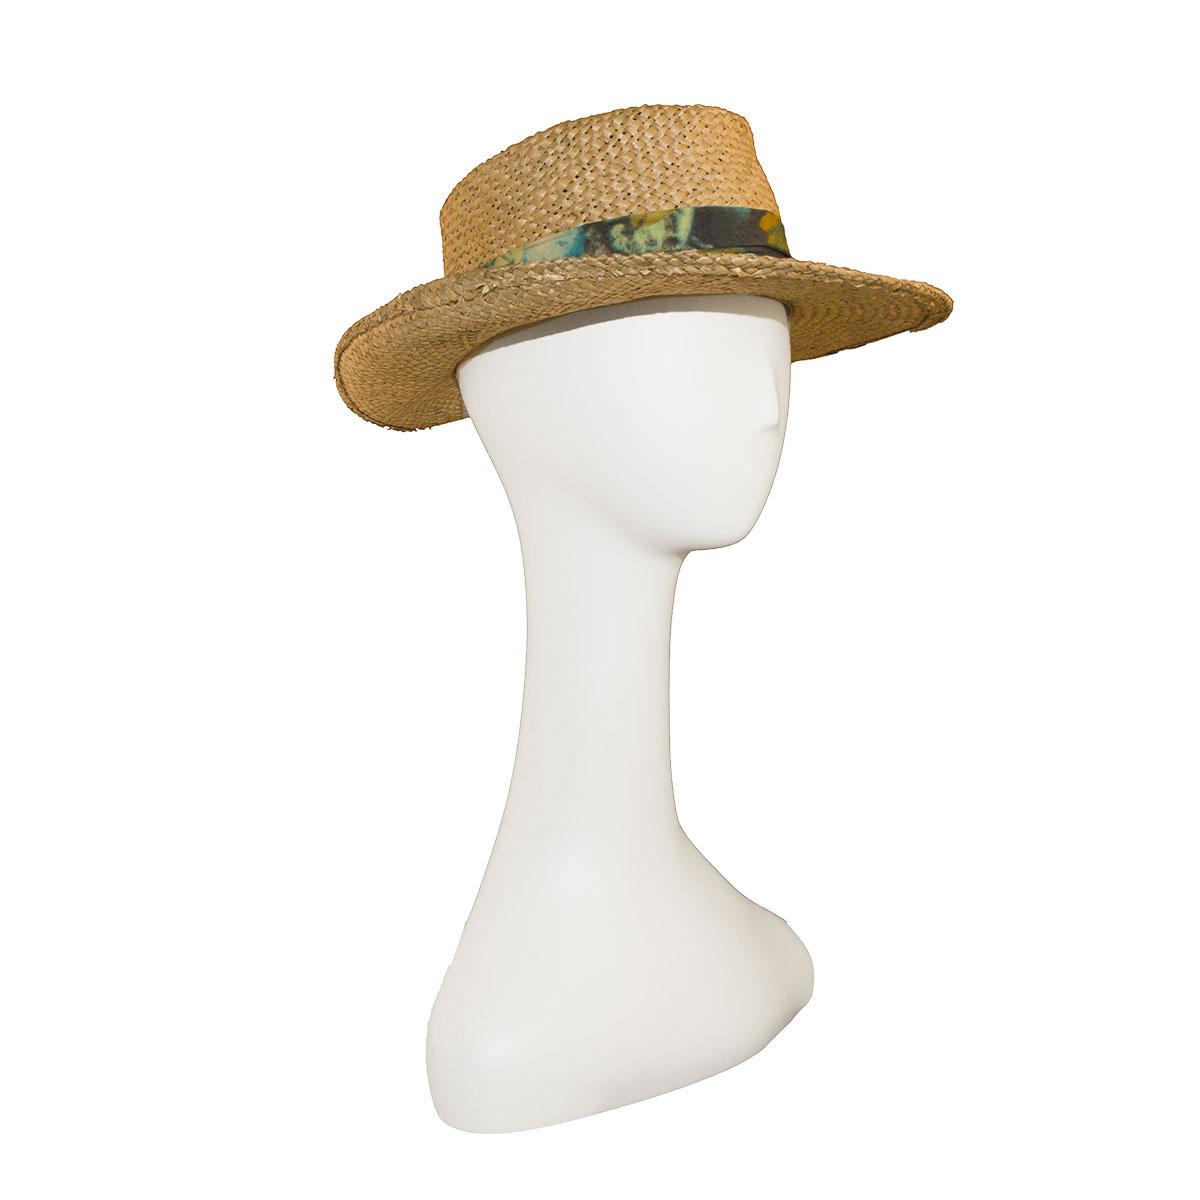 Tropical hat